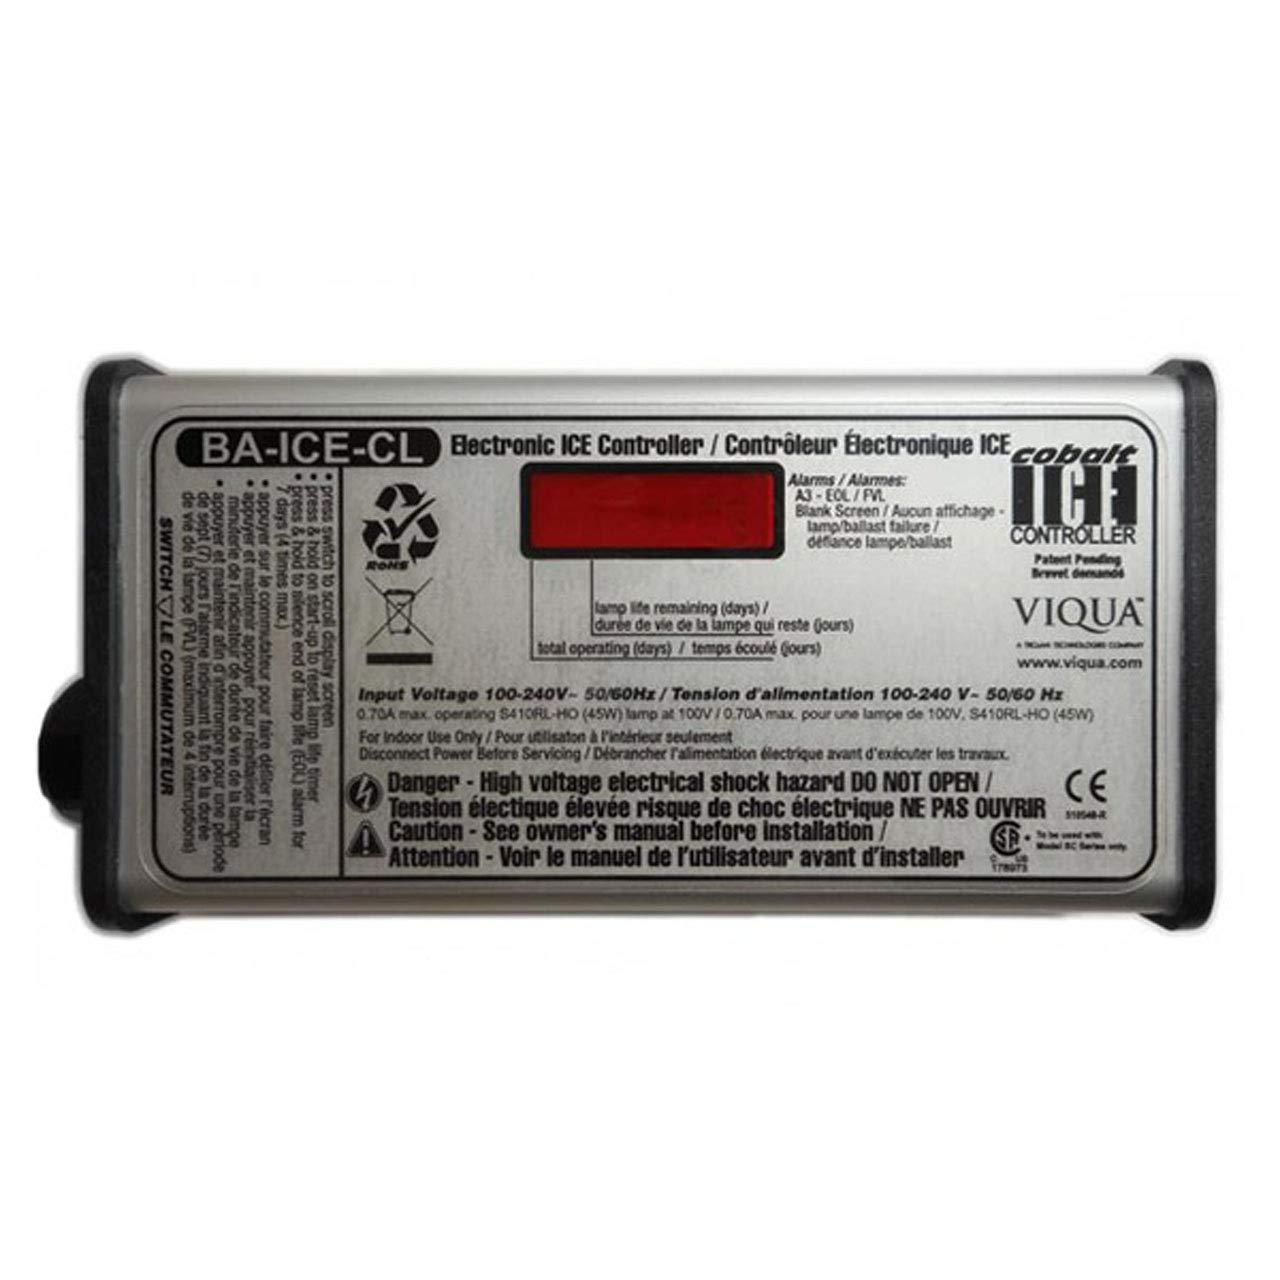 Genuine Viqua BA-ICE-C/CL/S/SO Replacement Ballast Controller Kit 100-250V for SQ-OZ / S8Q-OZ/SQ-PA SERIES / VH200 / VH410 / SC-200/320 / VP600 / VP950 / SC-600/740. (Viqua BA-ICE-CL)